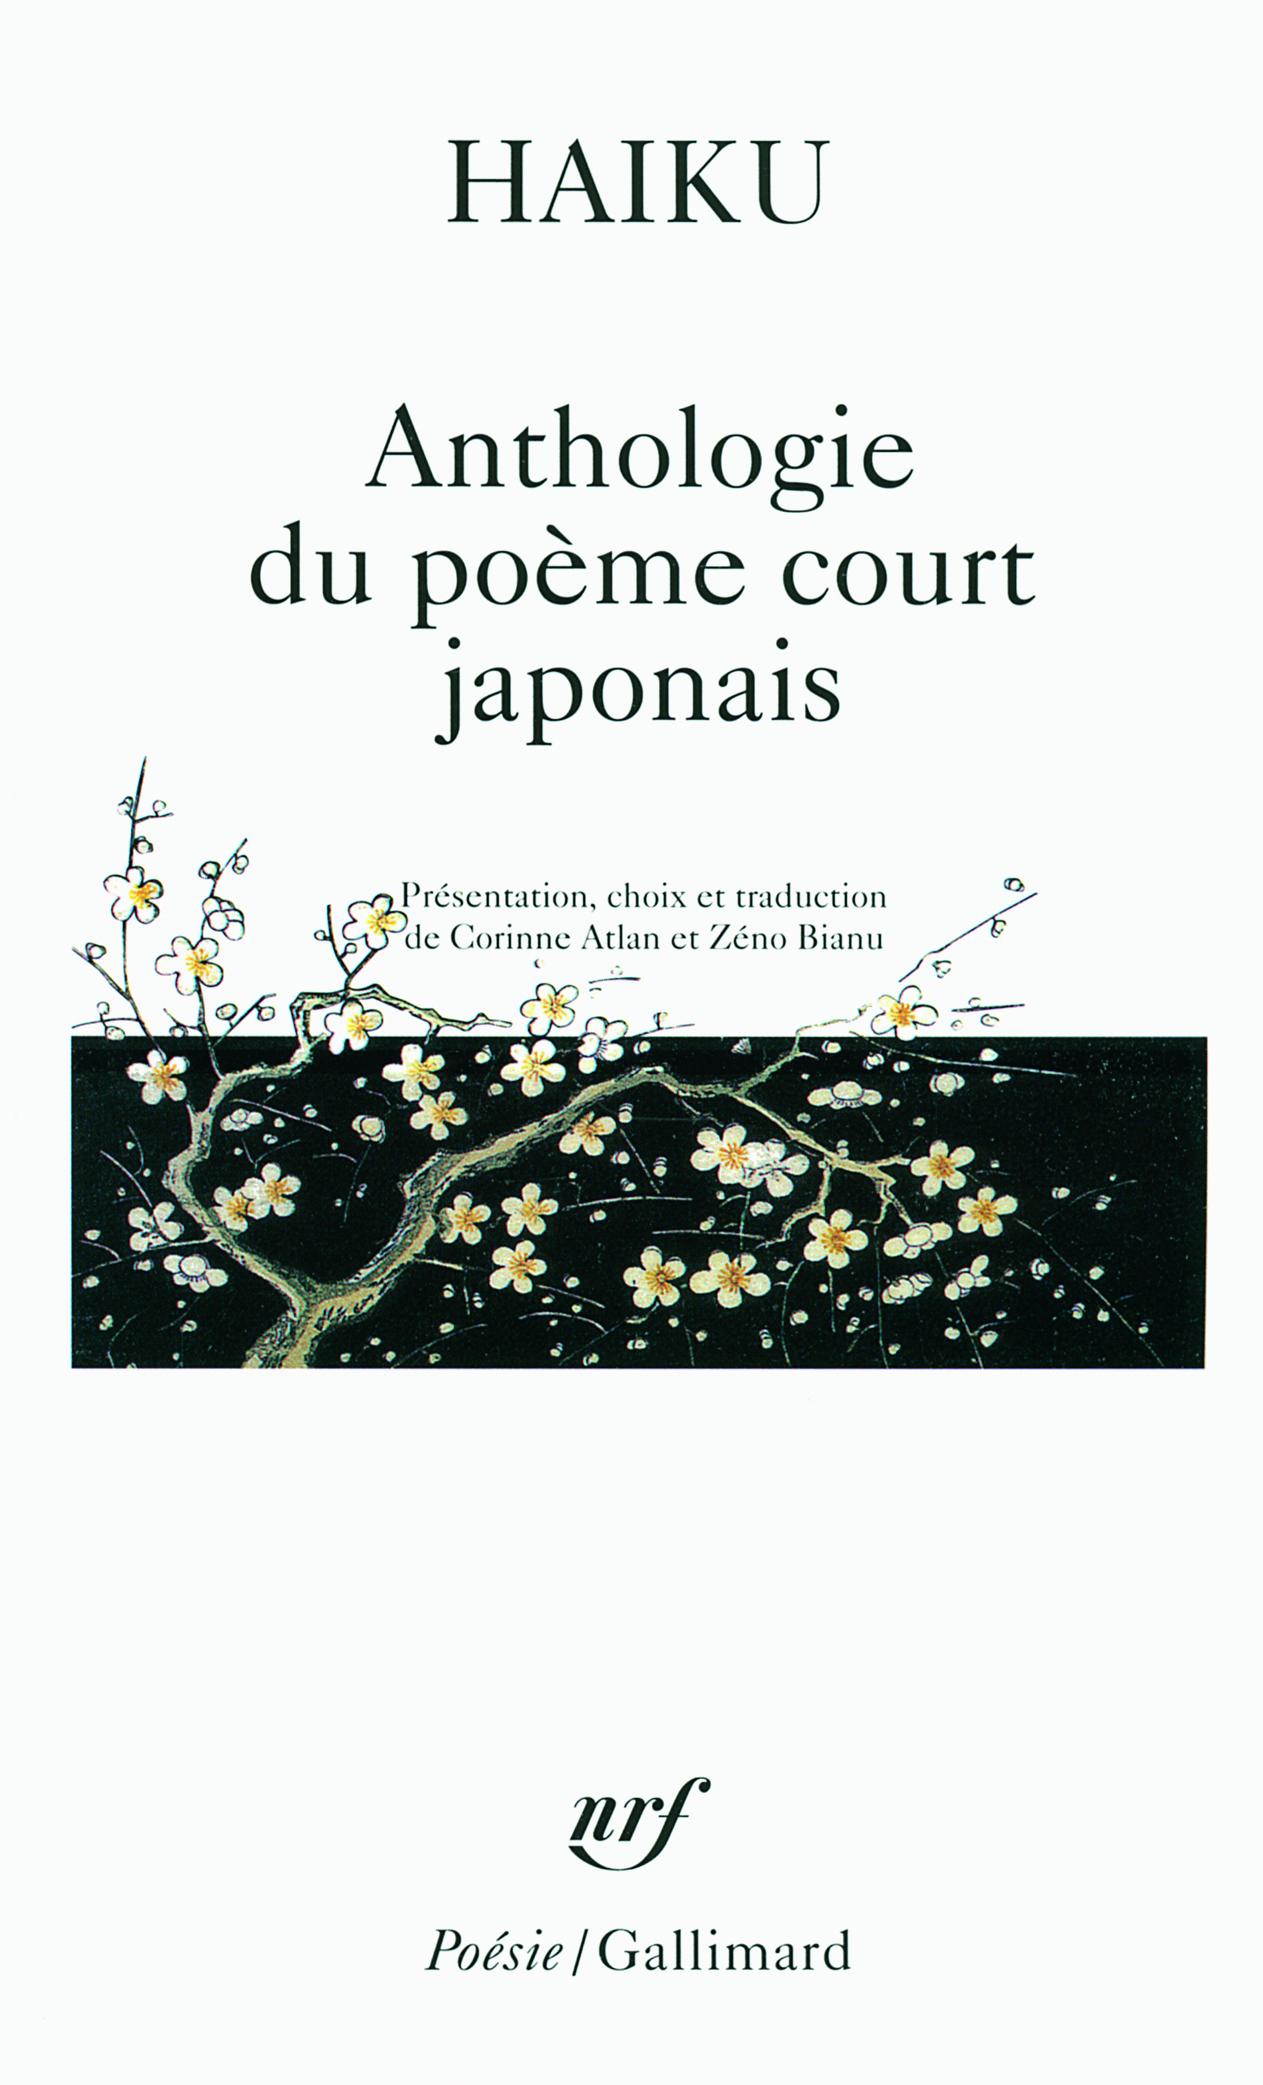 HAIKU ANTHOLOGIE DU POEME COURT JAPONAIS